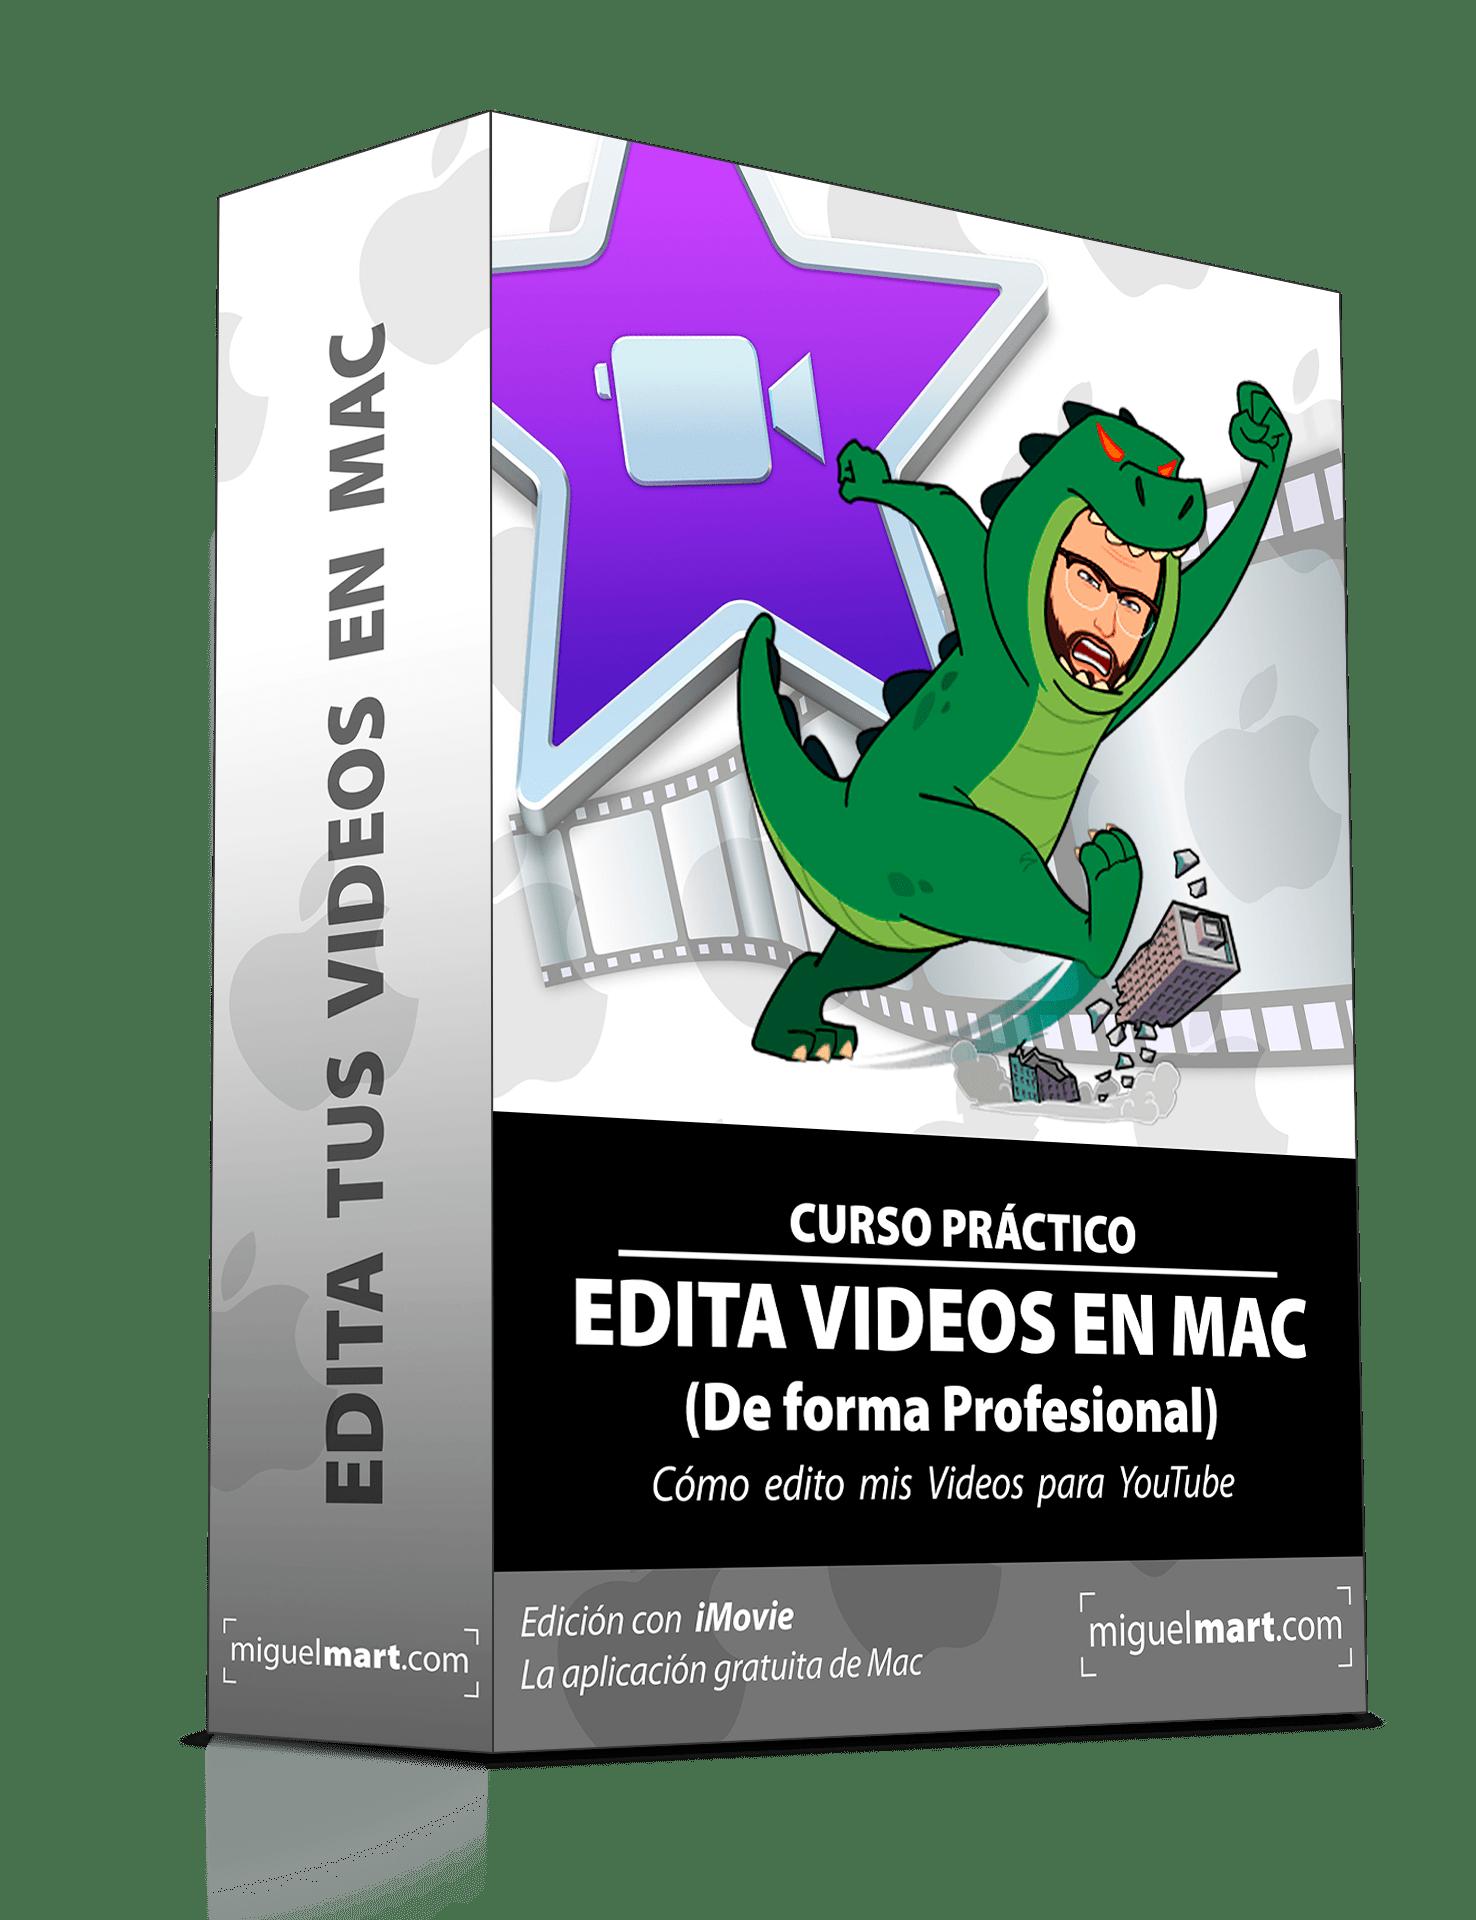 Edita tus videos como un profesional en Mac con iMovie.png